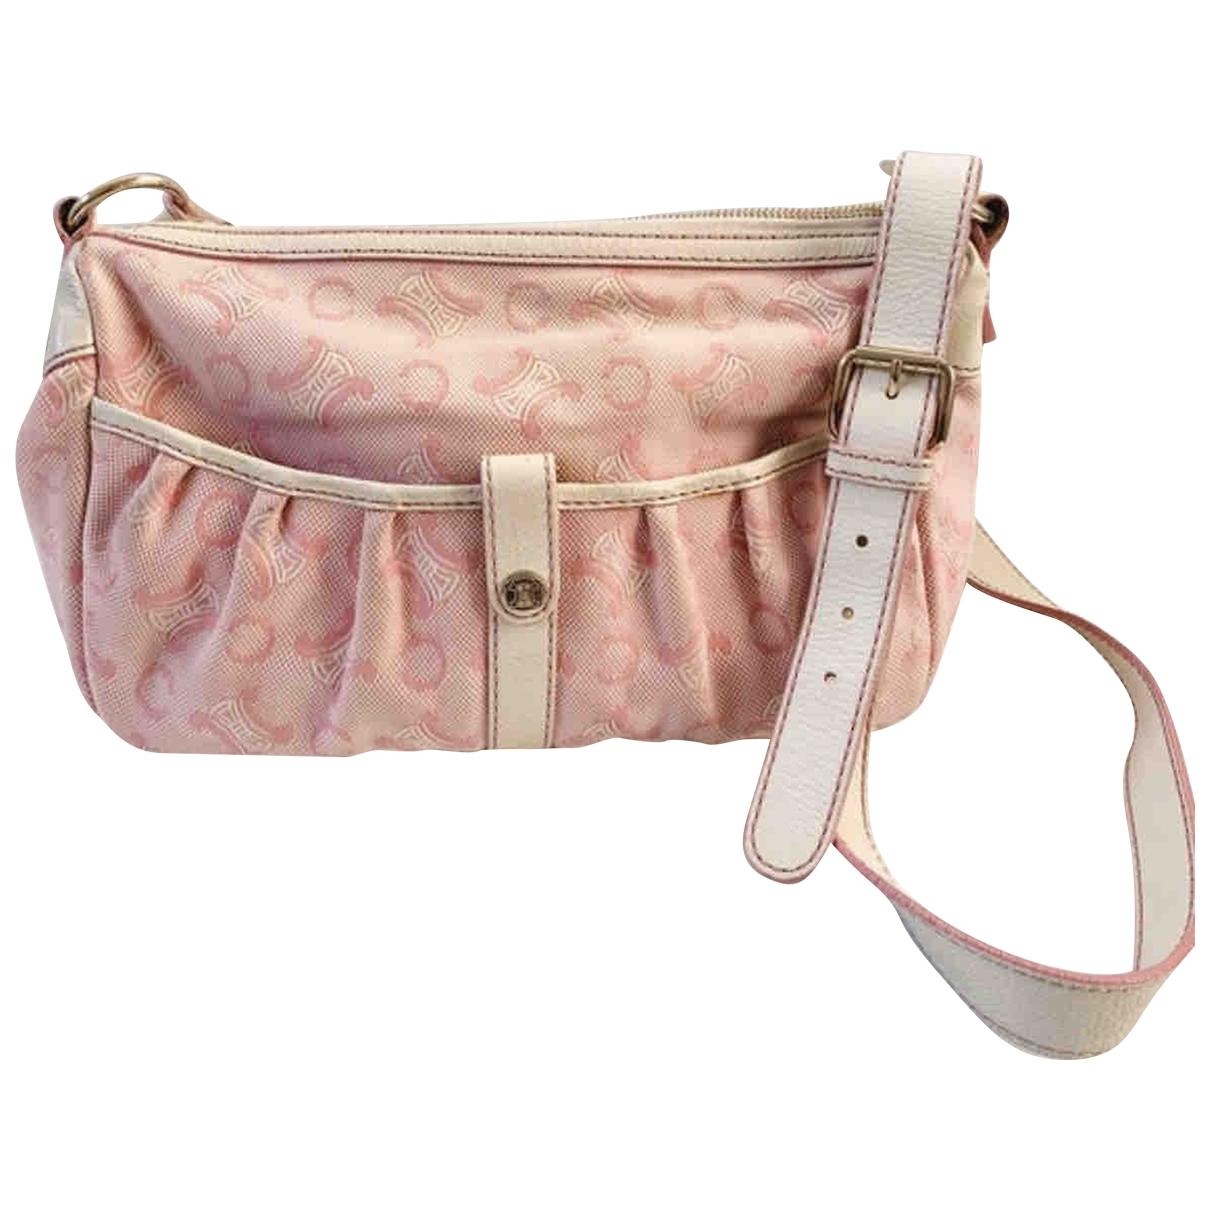 Celine \N Pink Denim - Jeans handbag for Women \N